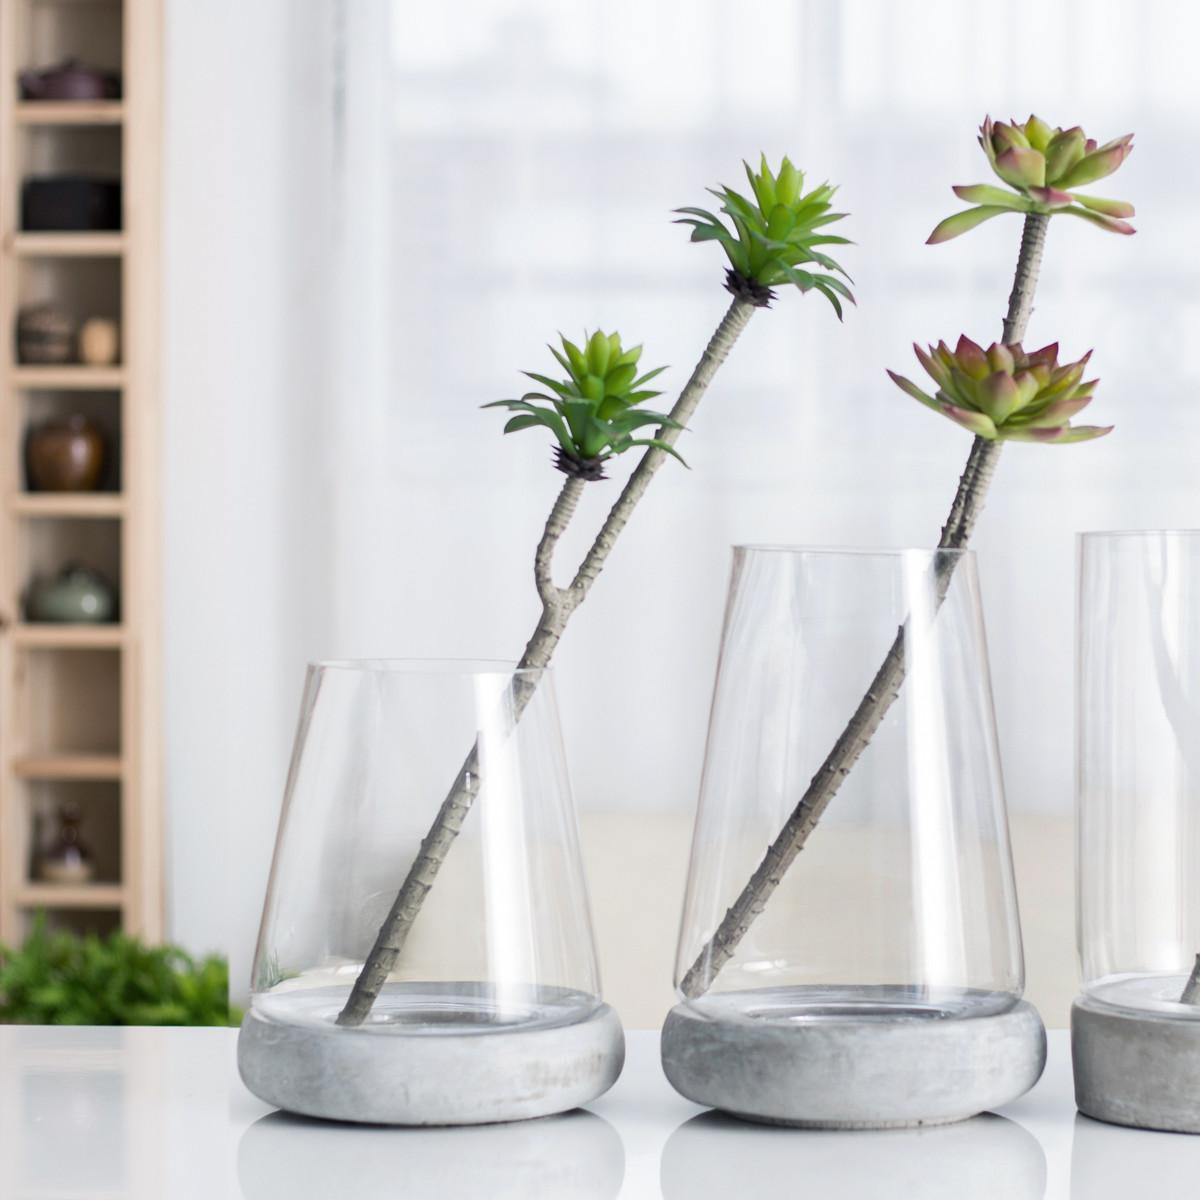 28 Wonderful Floral Arrangement In Glass Vase